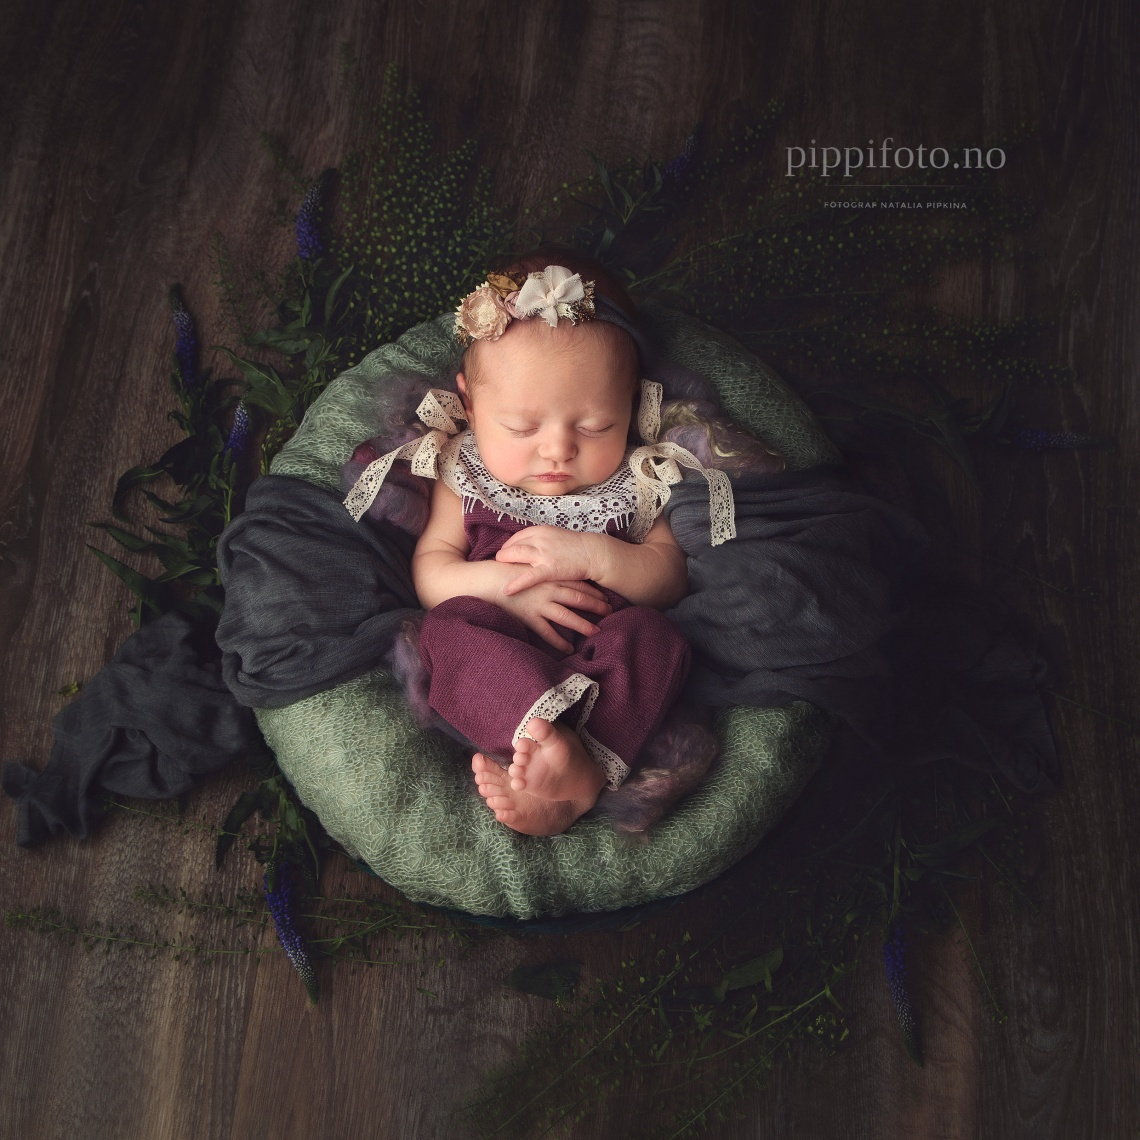 nyfødtfotografering-oslo-follo-fotograf-babyfoto-nyfødtbilder-venter-barn-gravid-nyfødtfoto-babyshower-jente